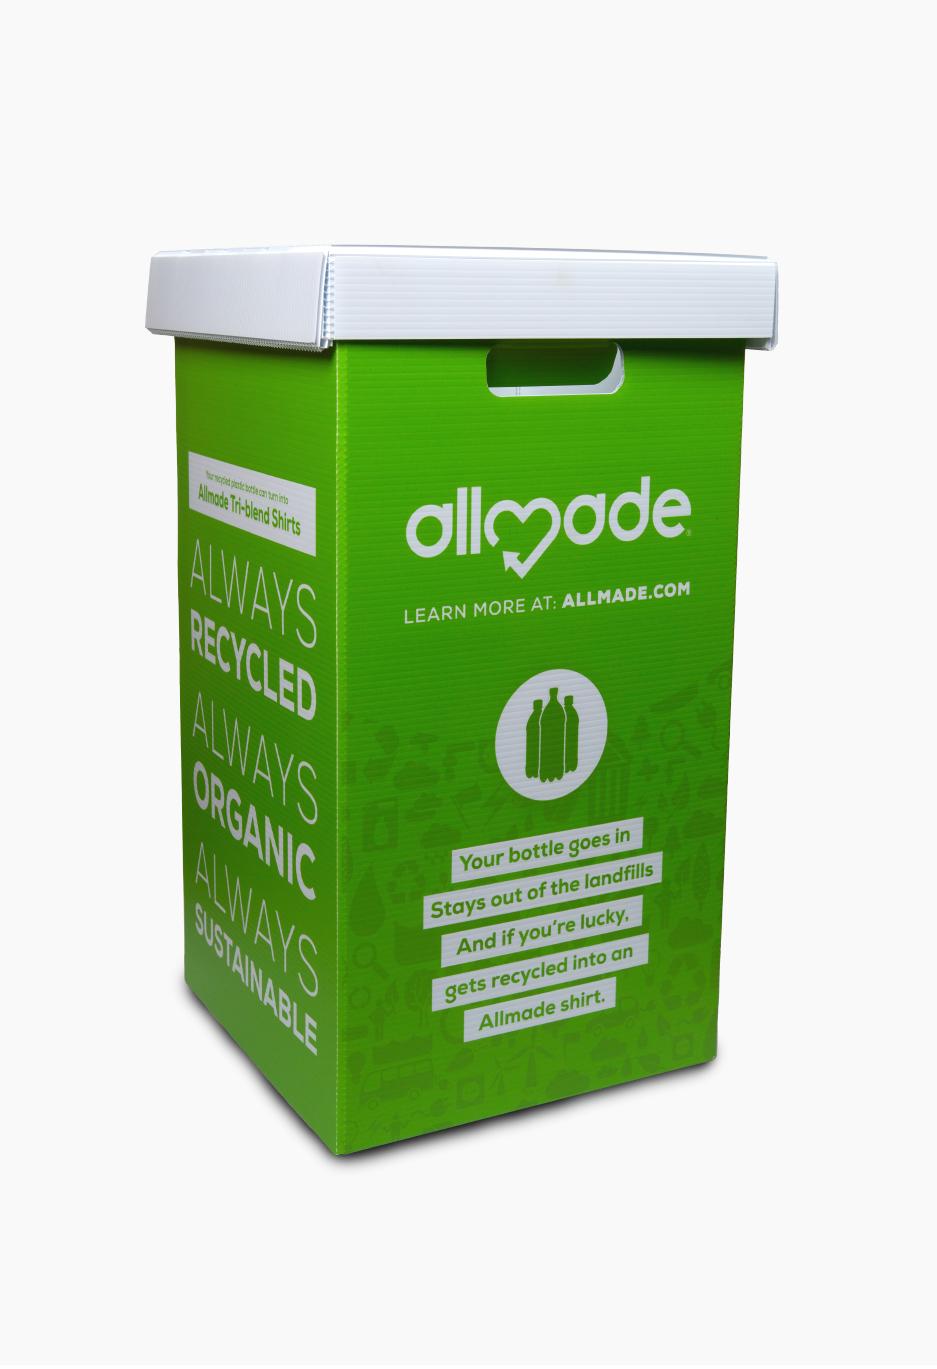 Allmade Recycled Bin